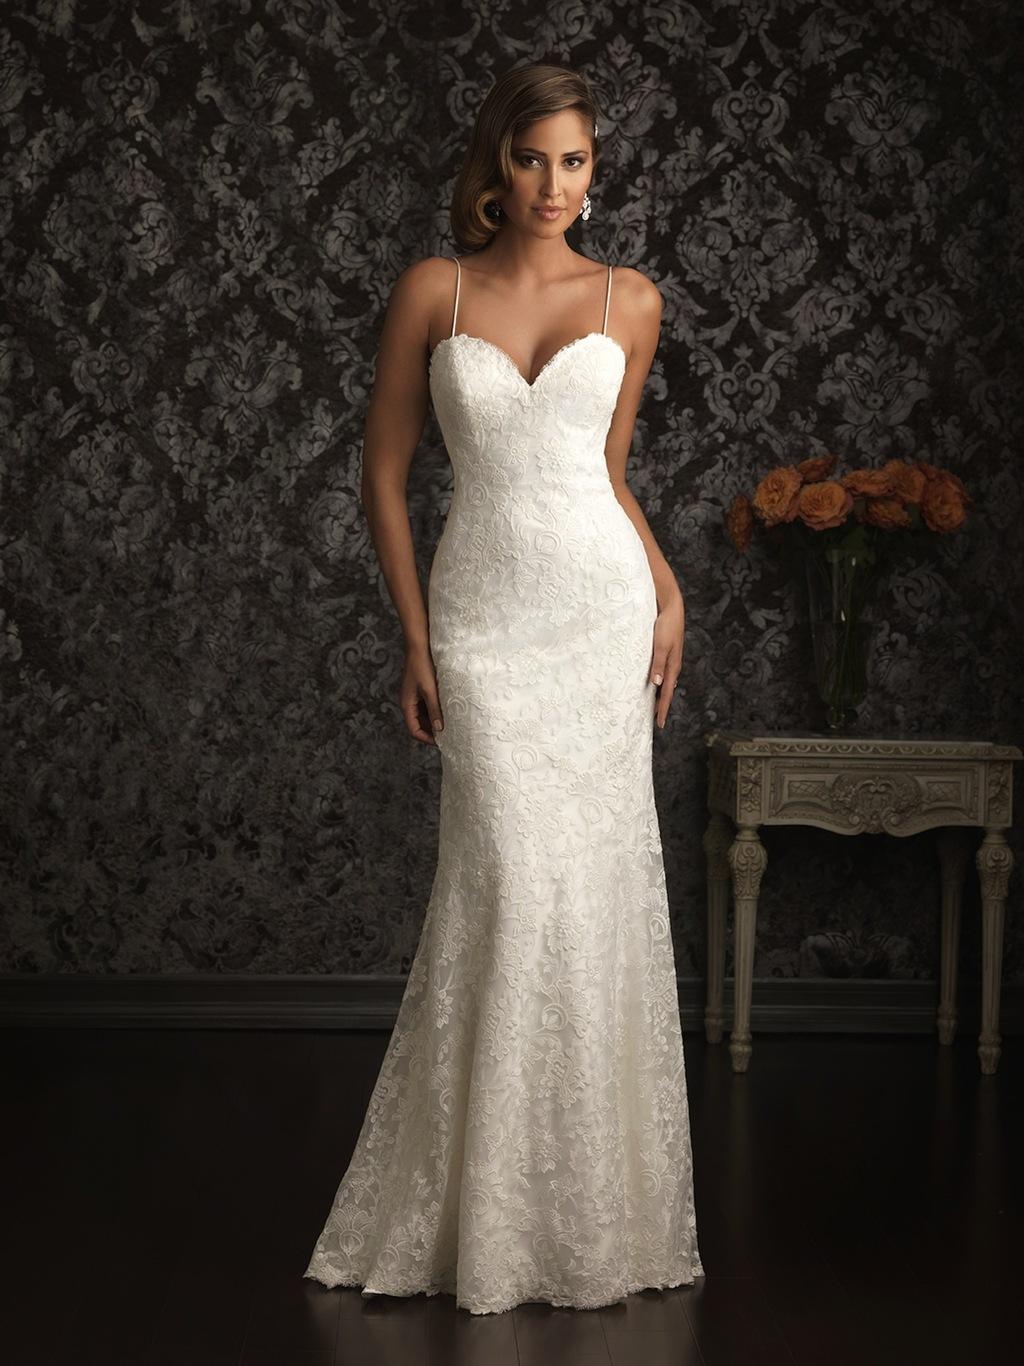 Allure Wedding Gowns 033 - Allure Wedding Gowns